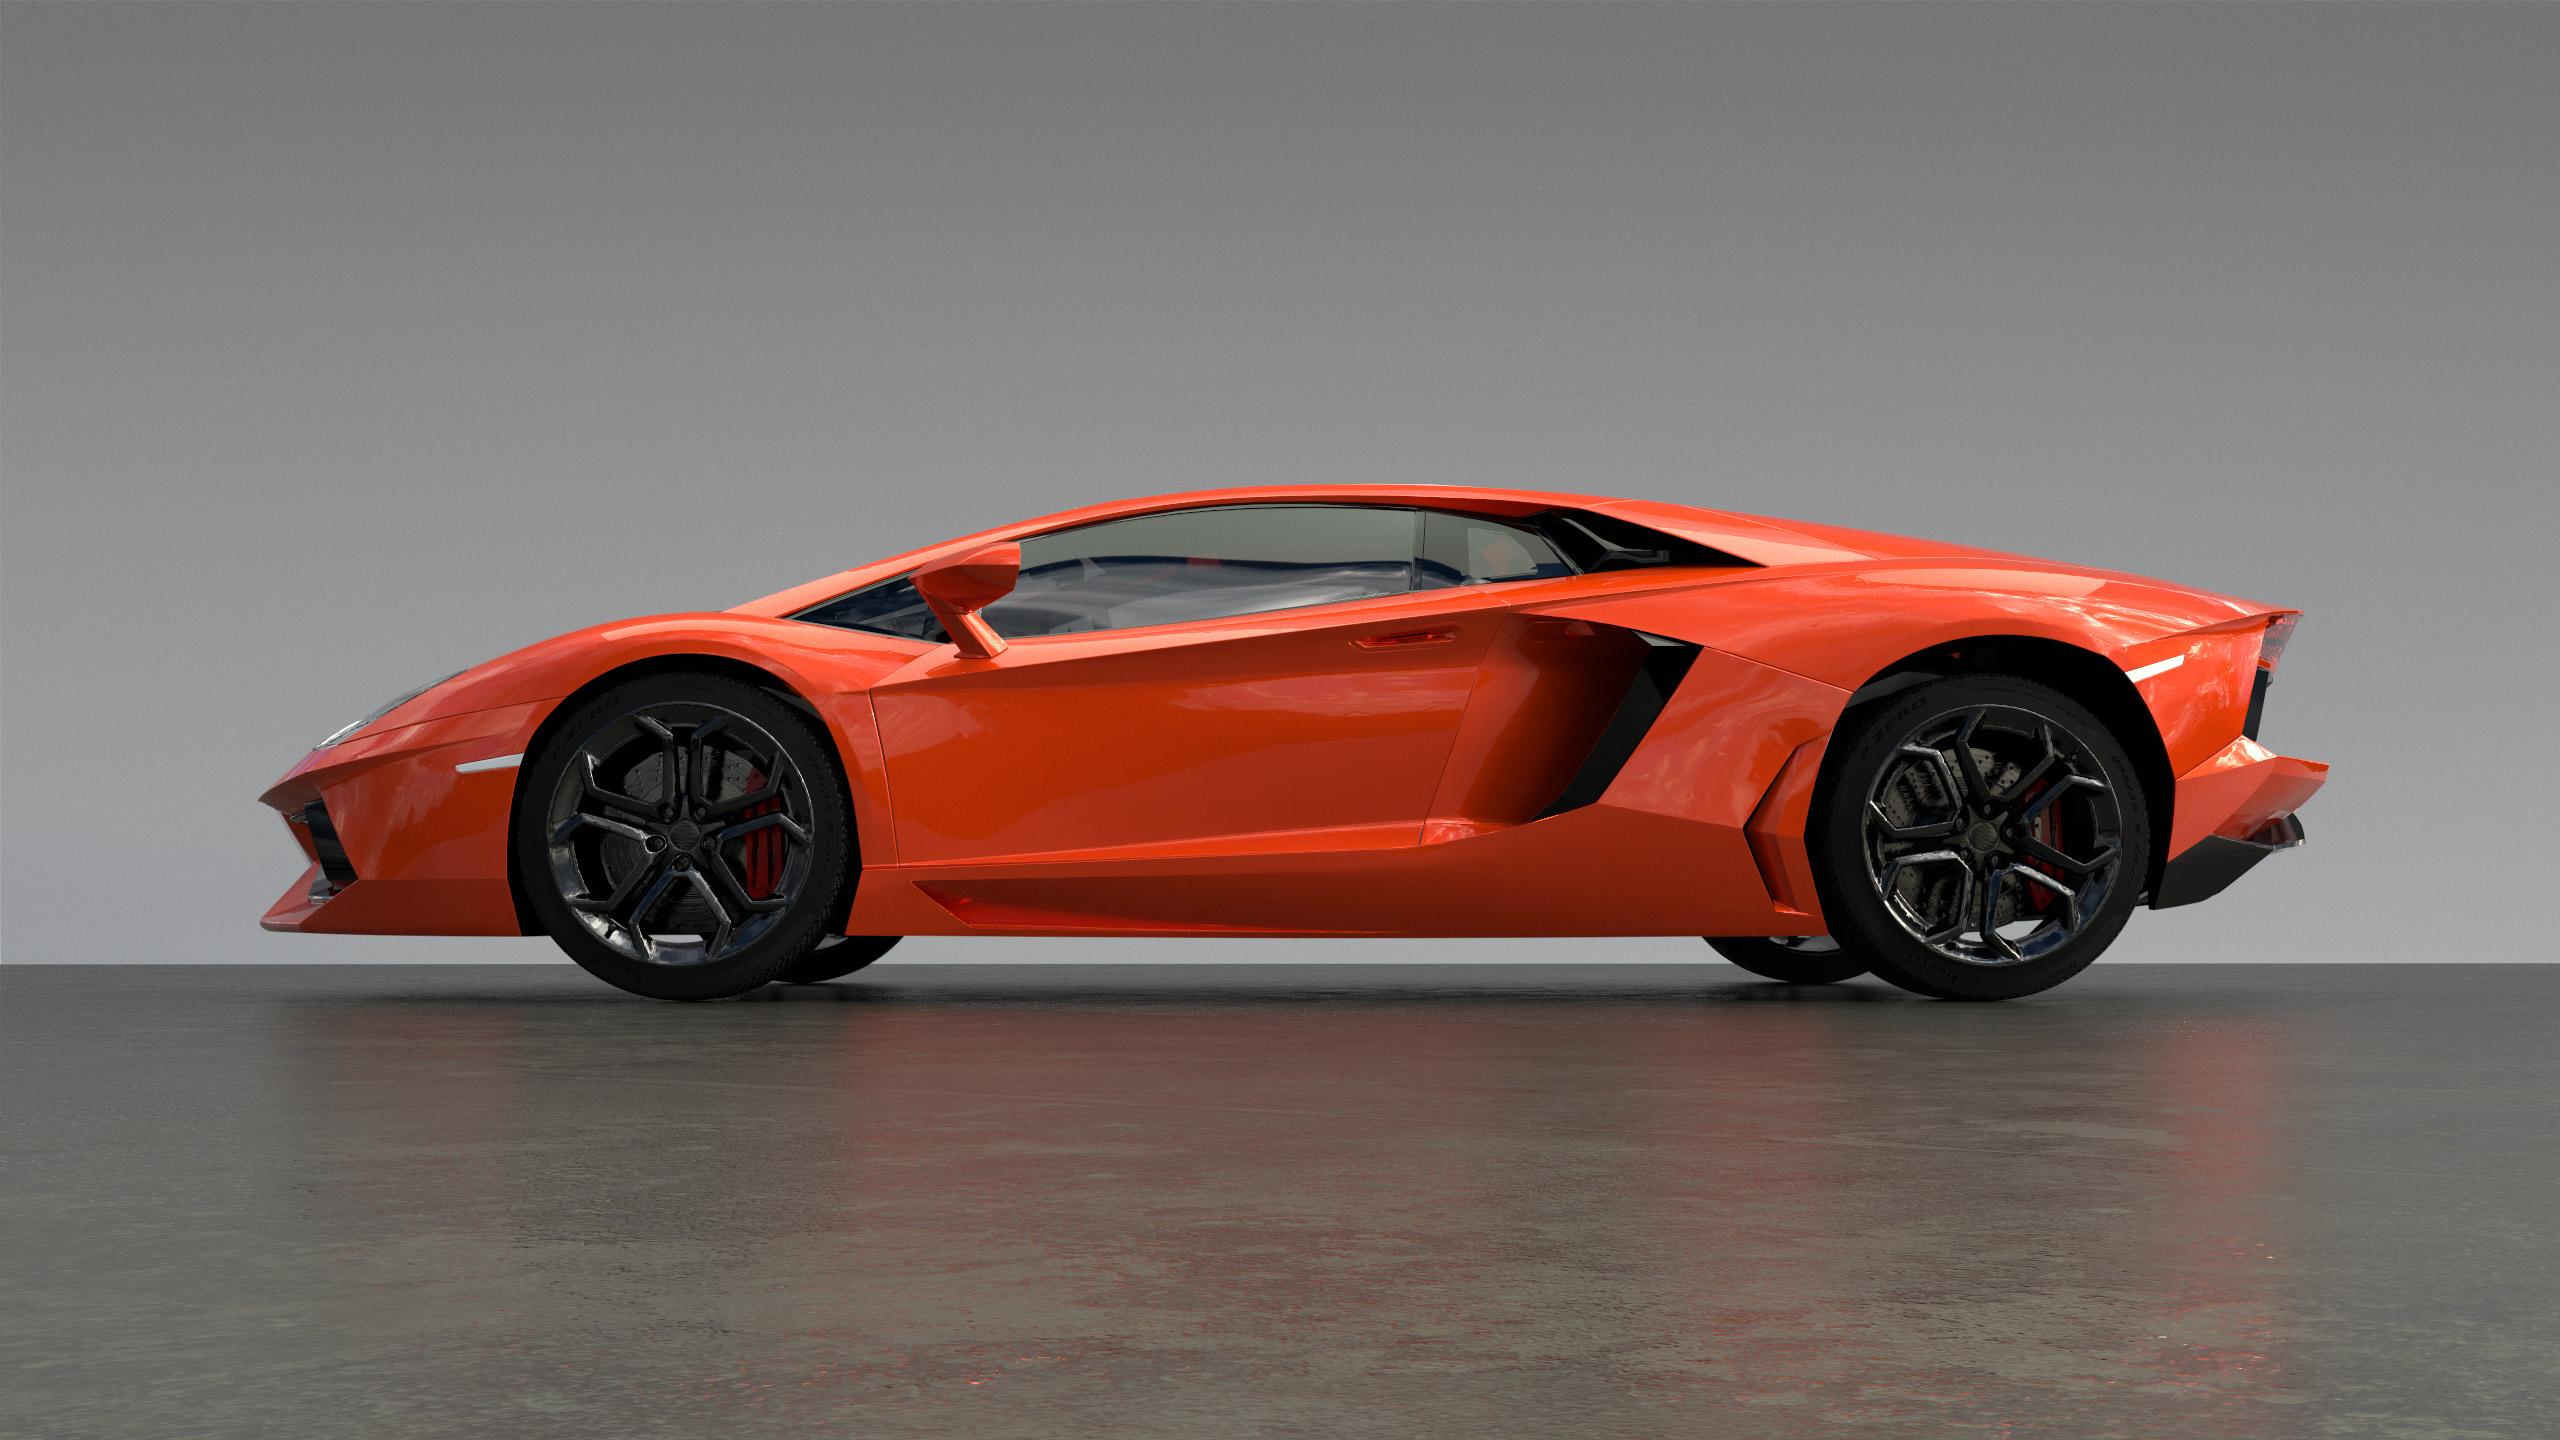 Figure 1: An orange-red Lamborghini Aventador, rendered in Takua a0.7 using VCM.